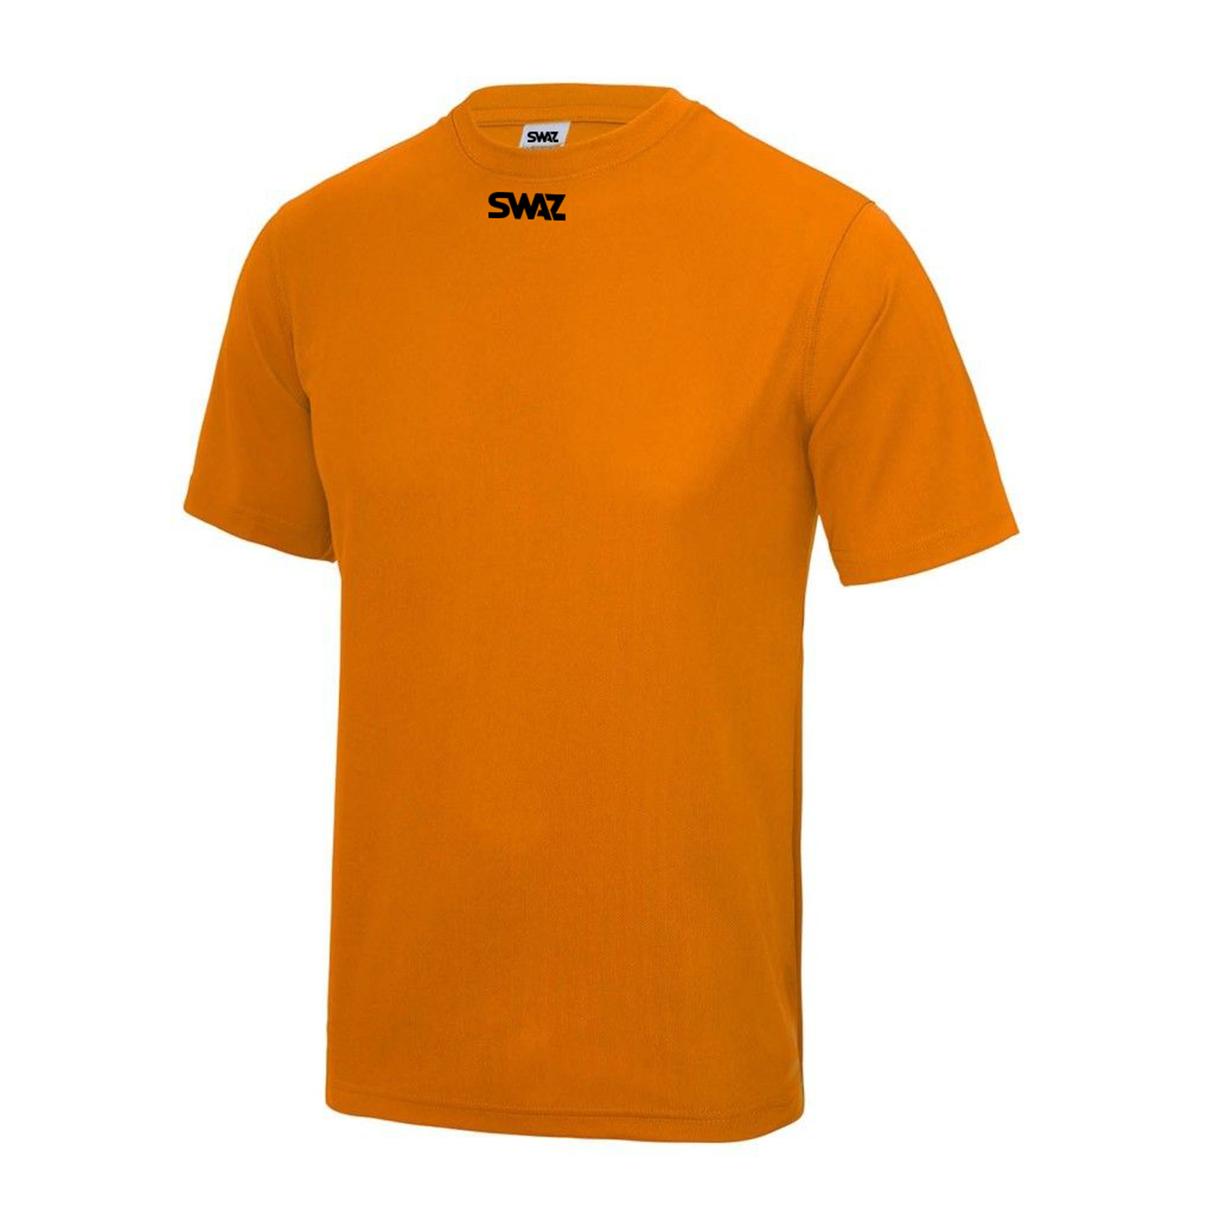 SWAZ Club Training T-Shirt – Orange